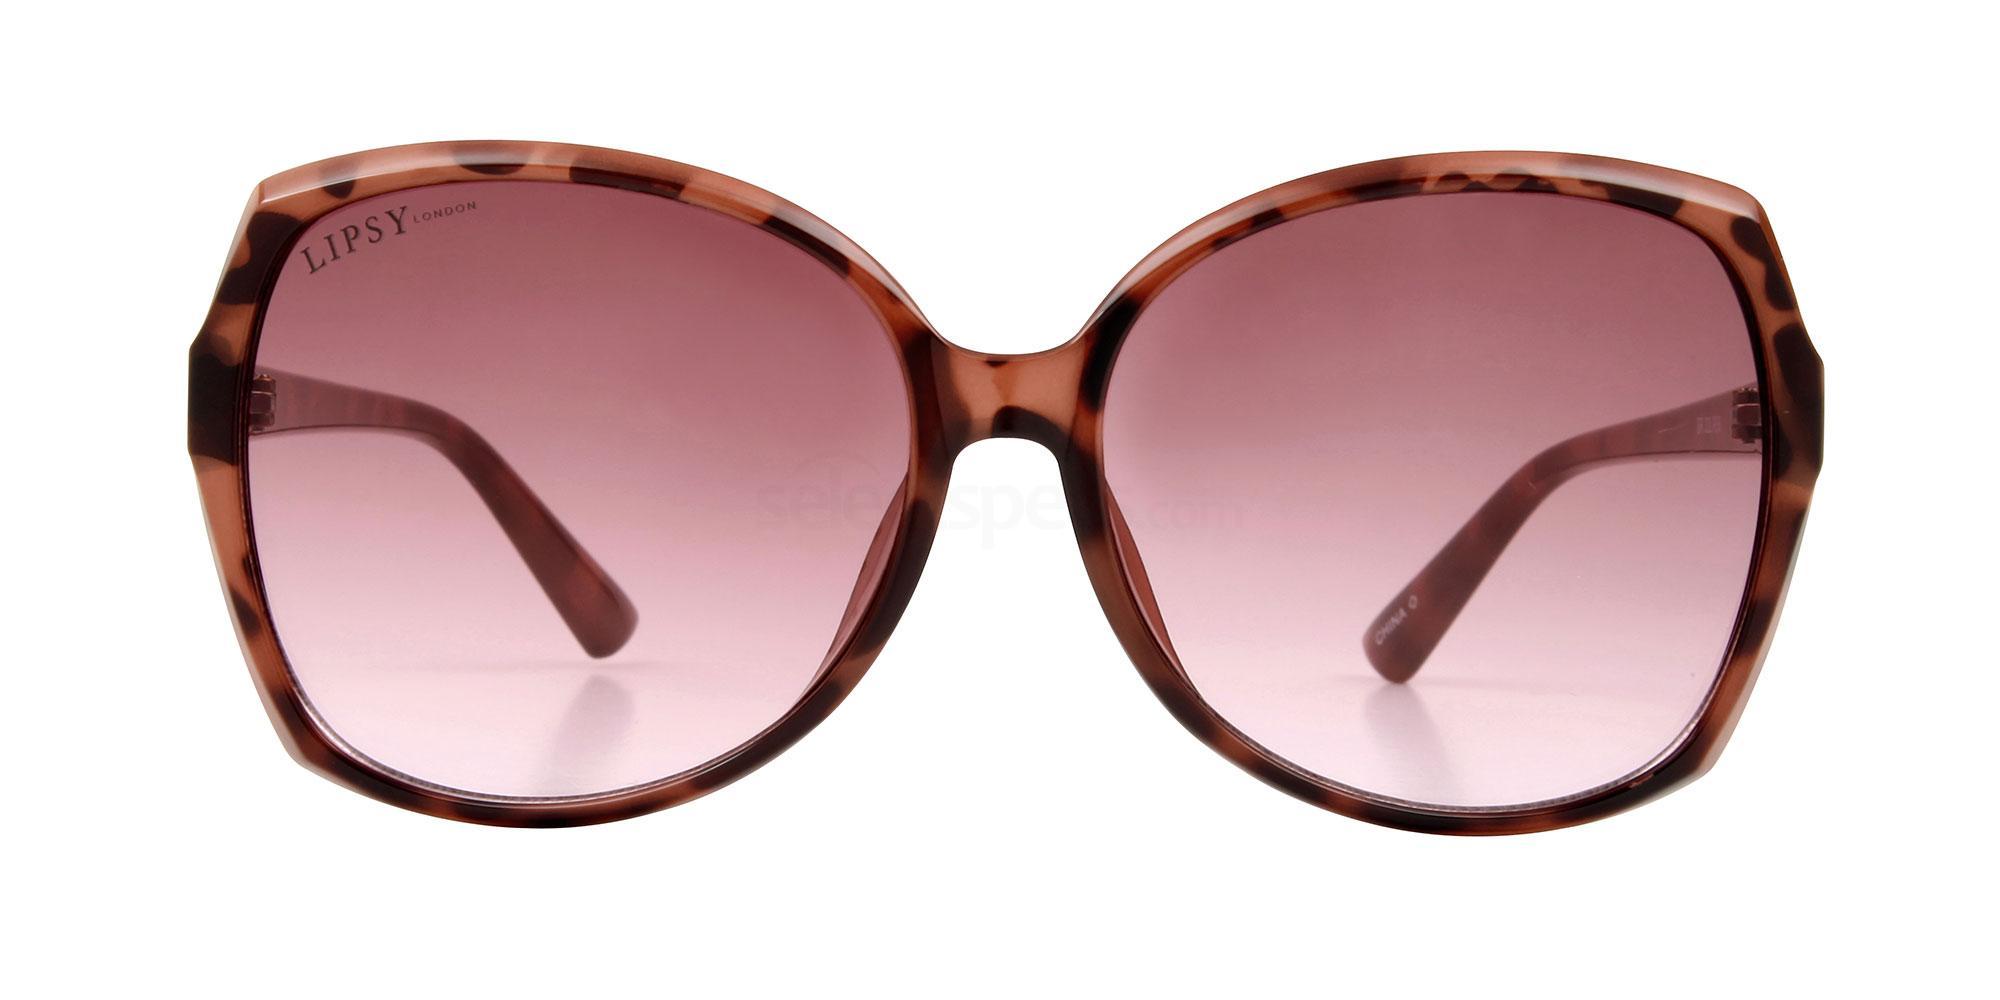 DEMI LIP024 Sunglasses, Lipsy